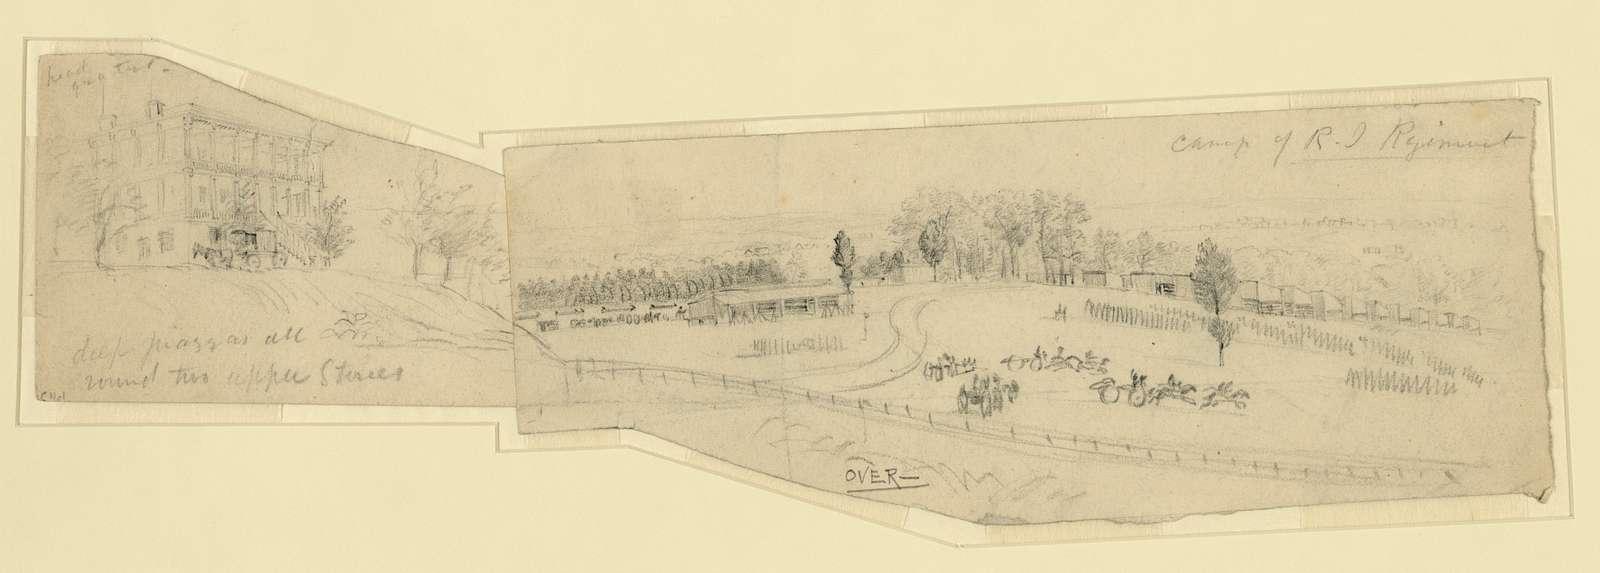 Camp of R.I. Regiment